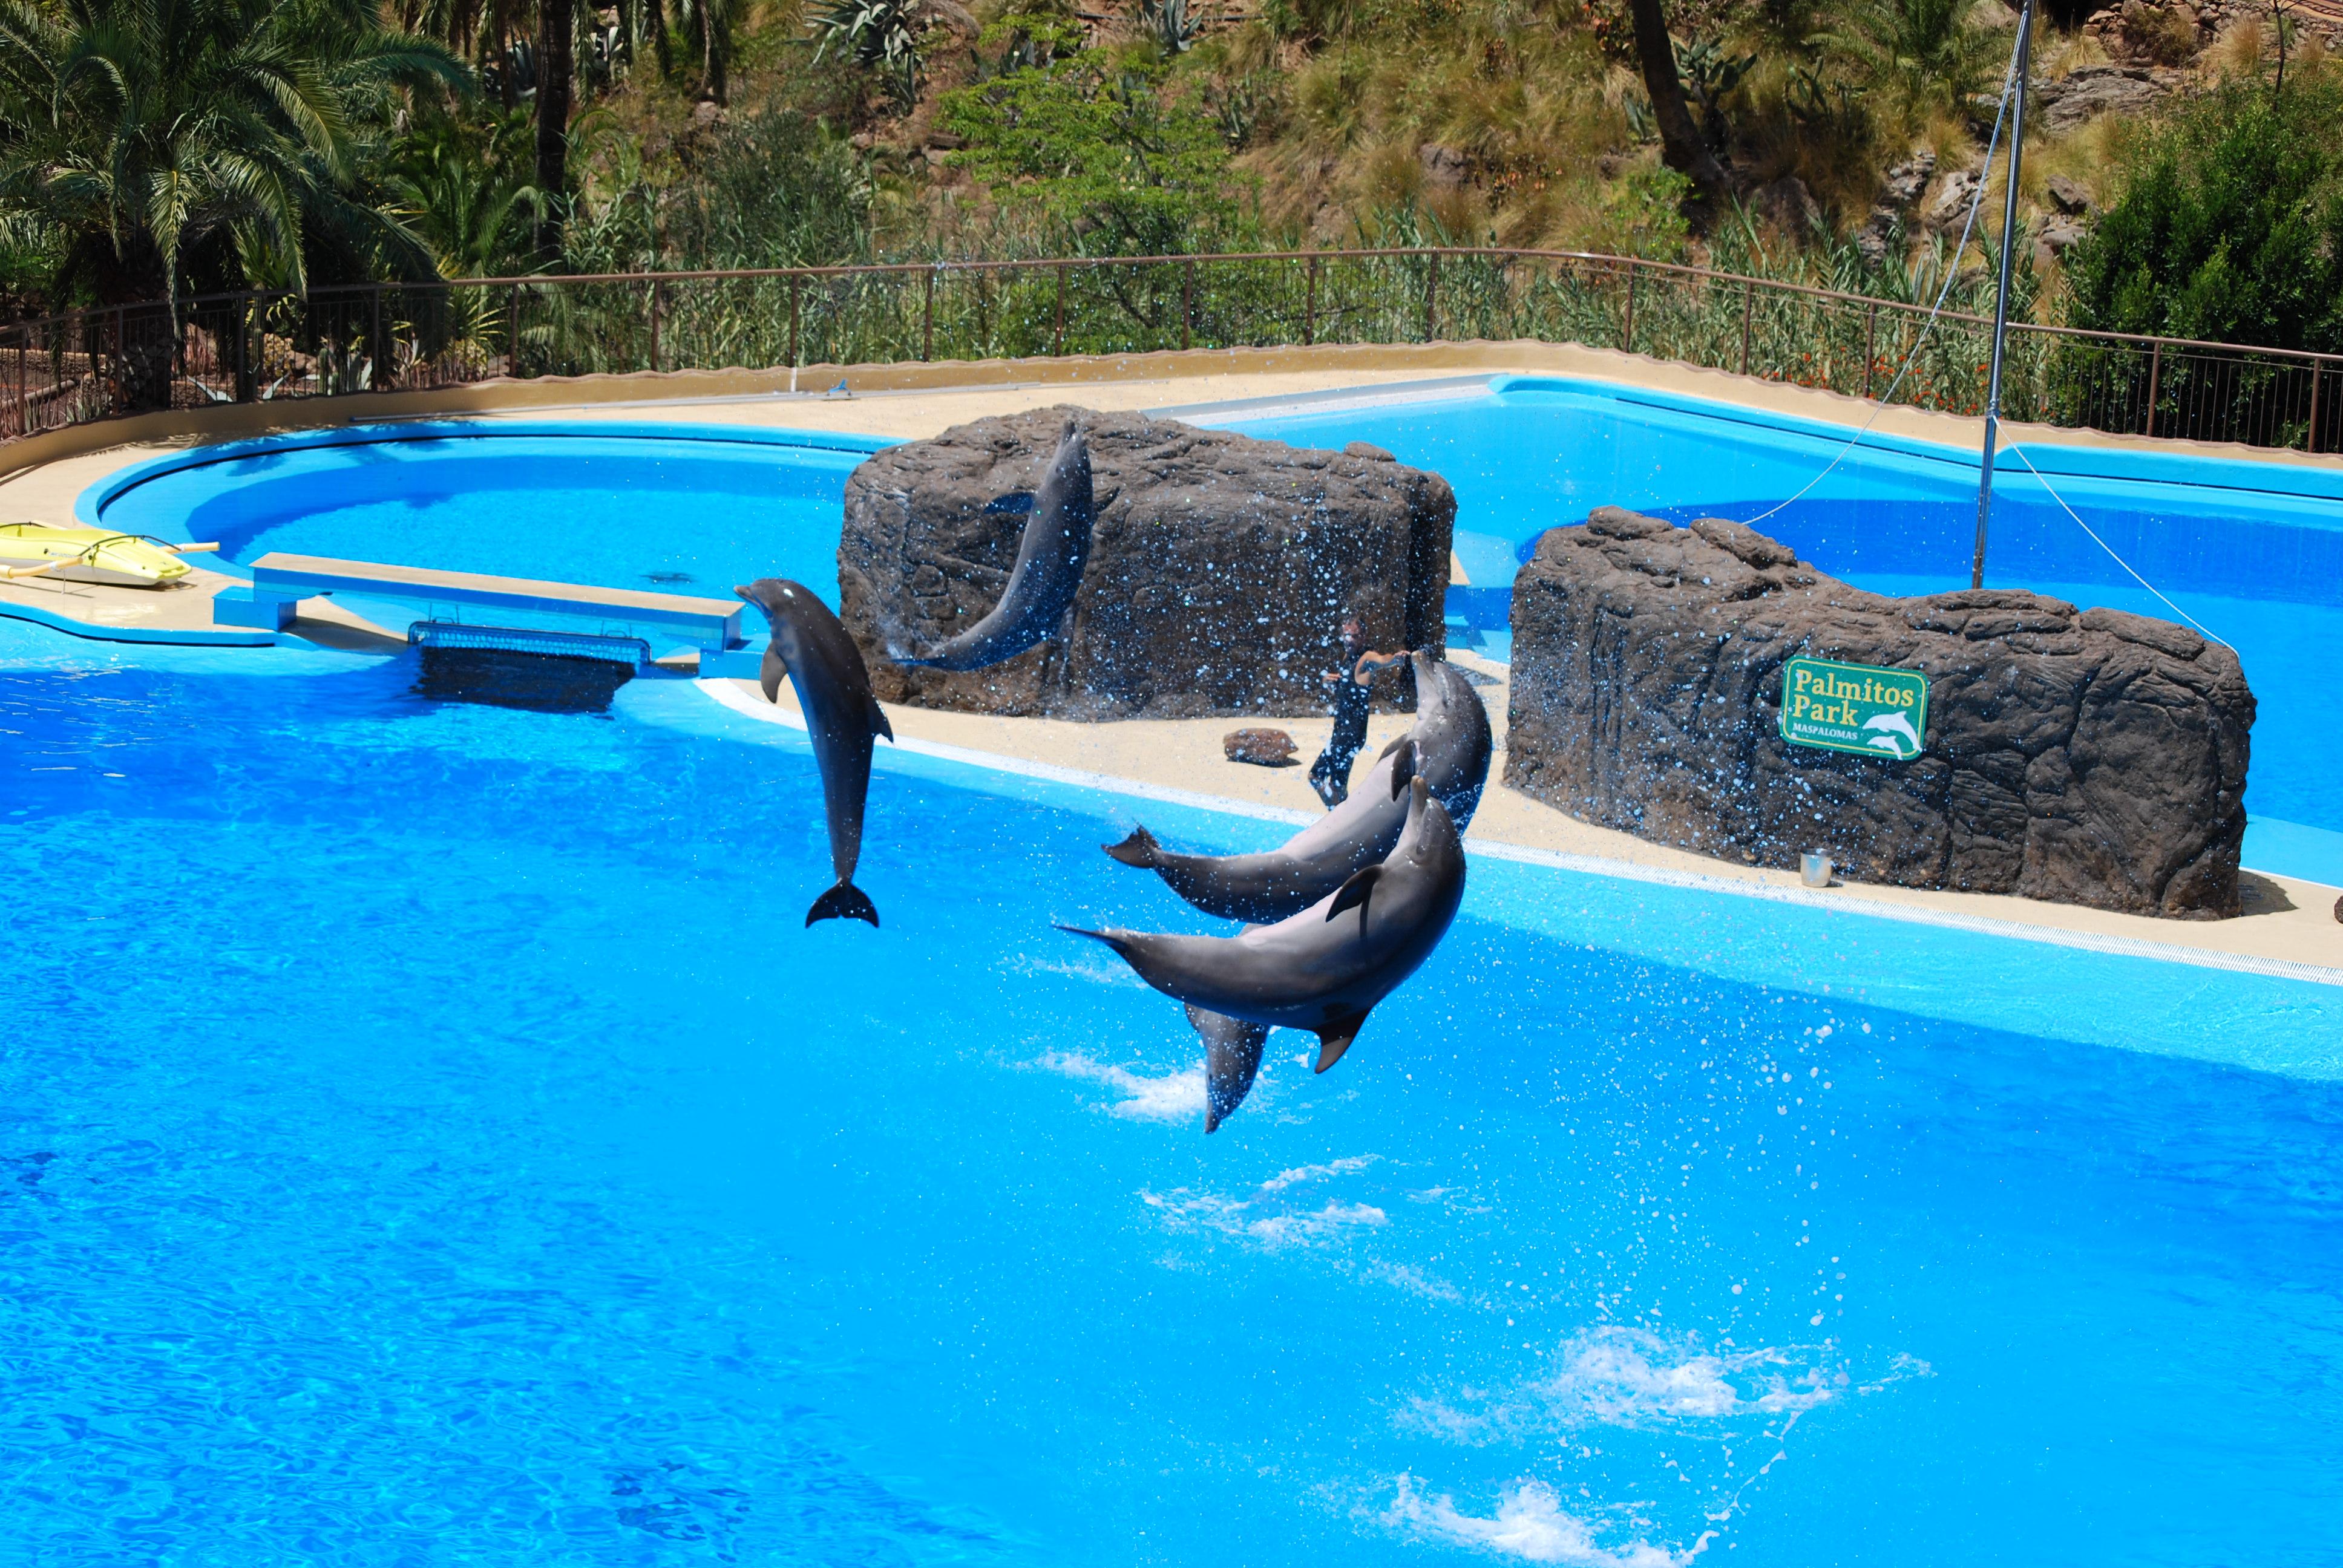 File:Delfine Palmitos Park 2010.JPG